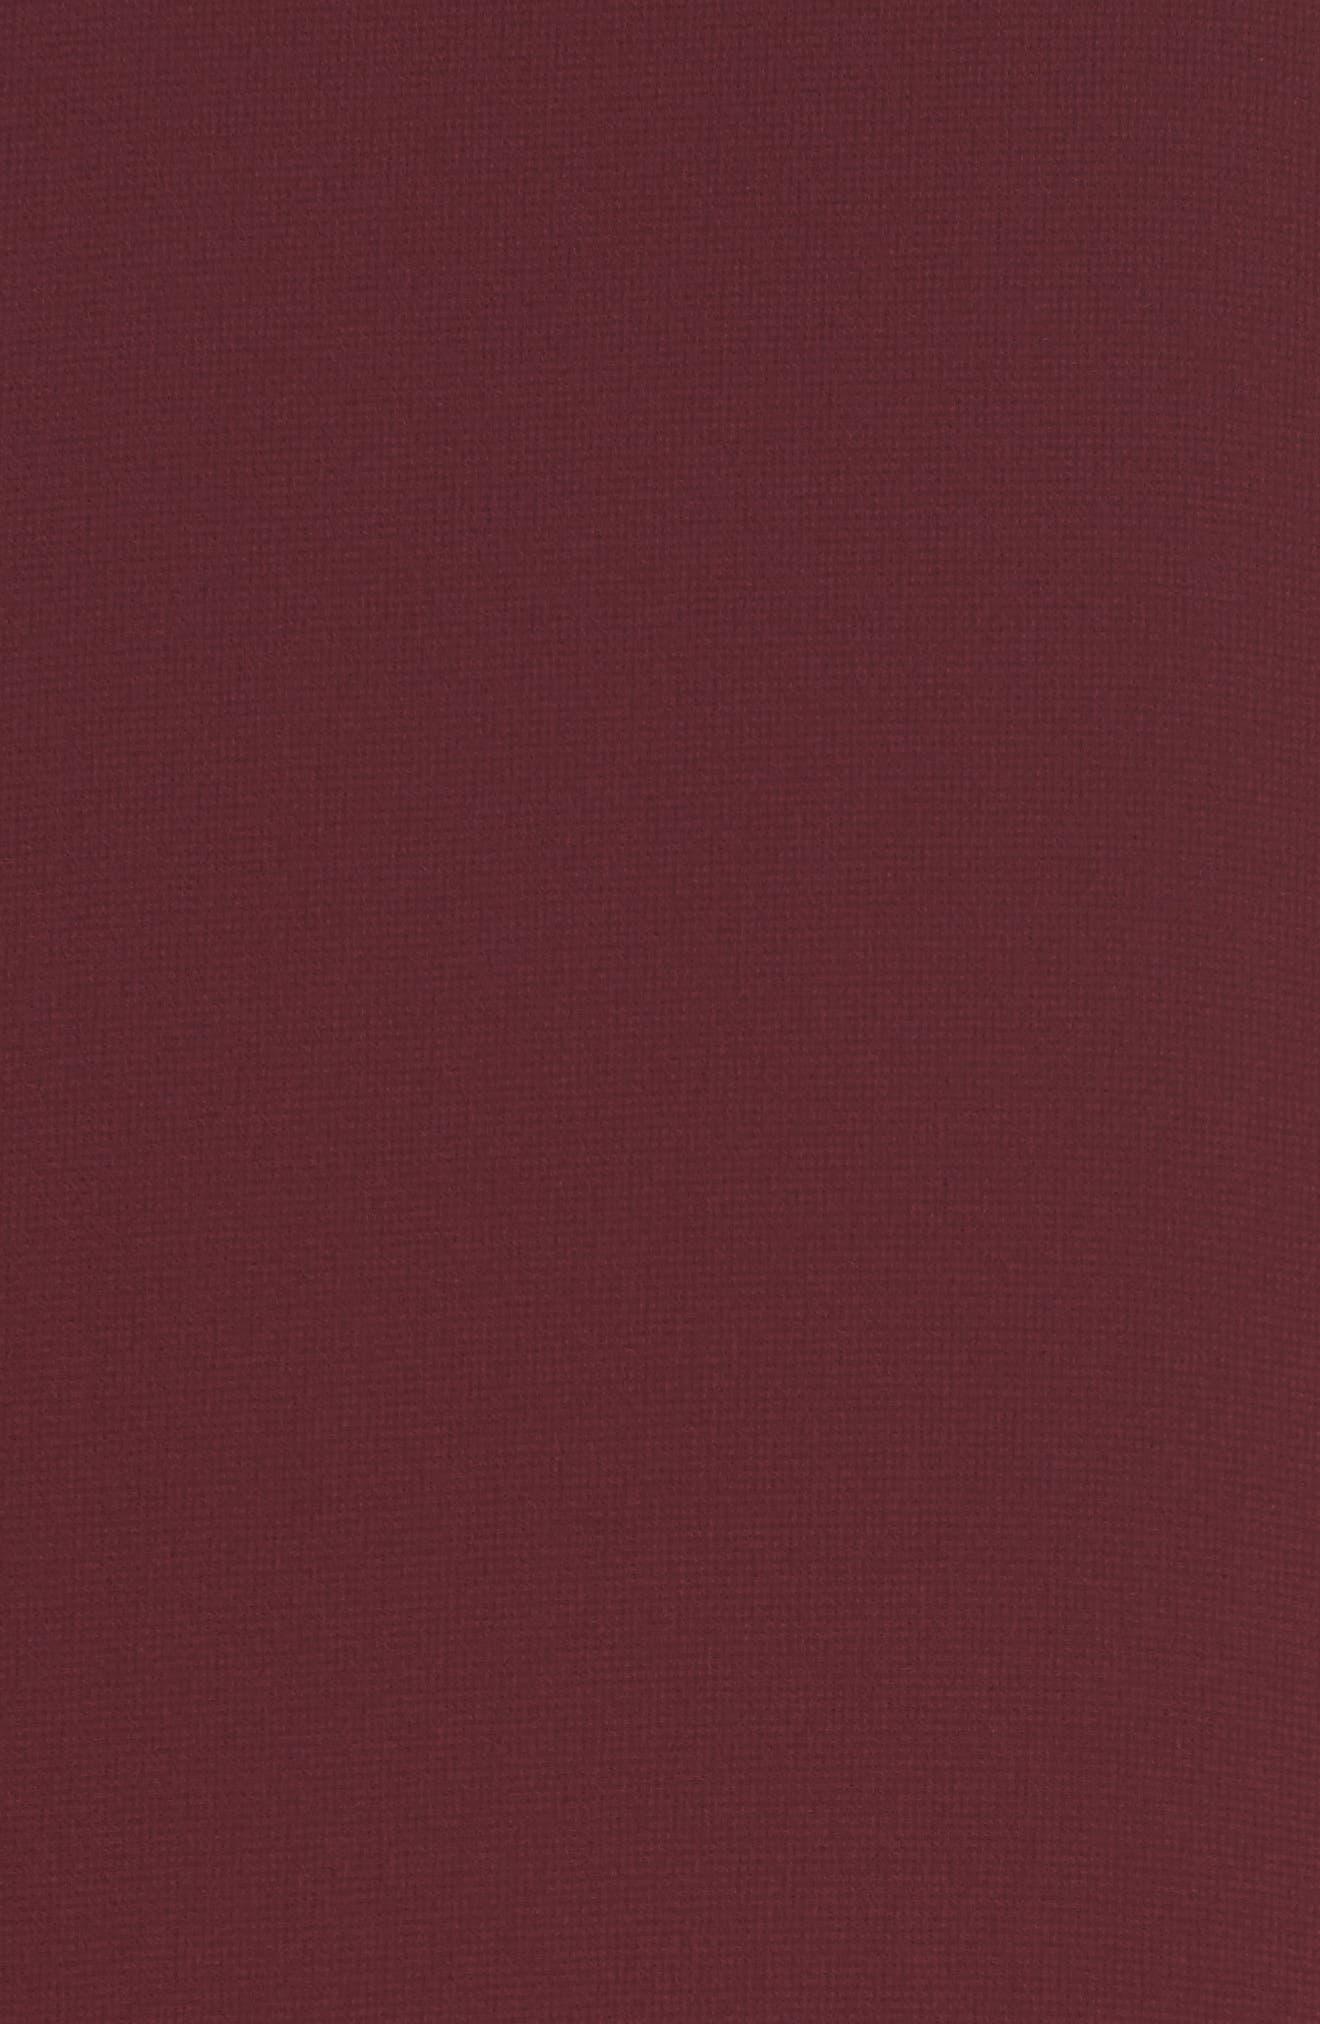 Bronte Maxi Dress,                             Alternate thumbnail 15, color,